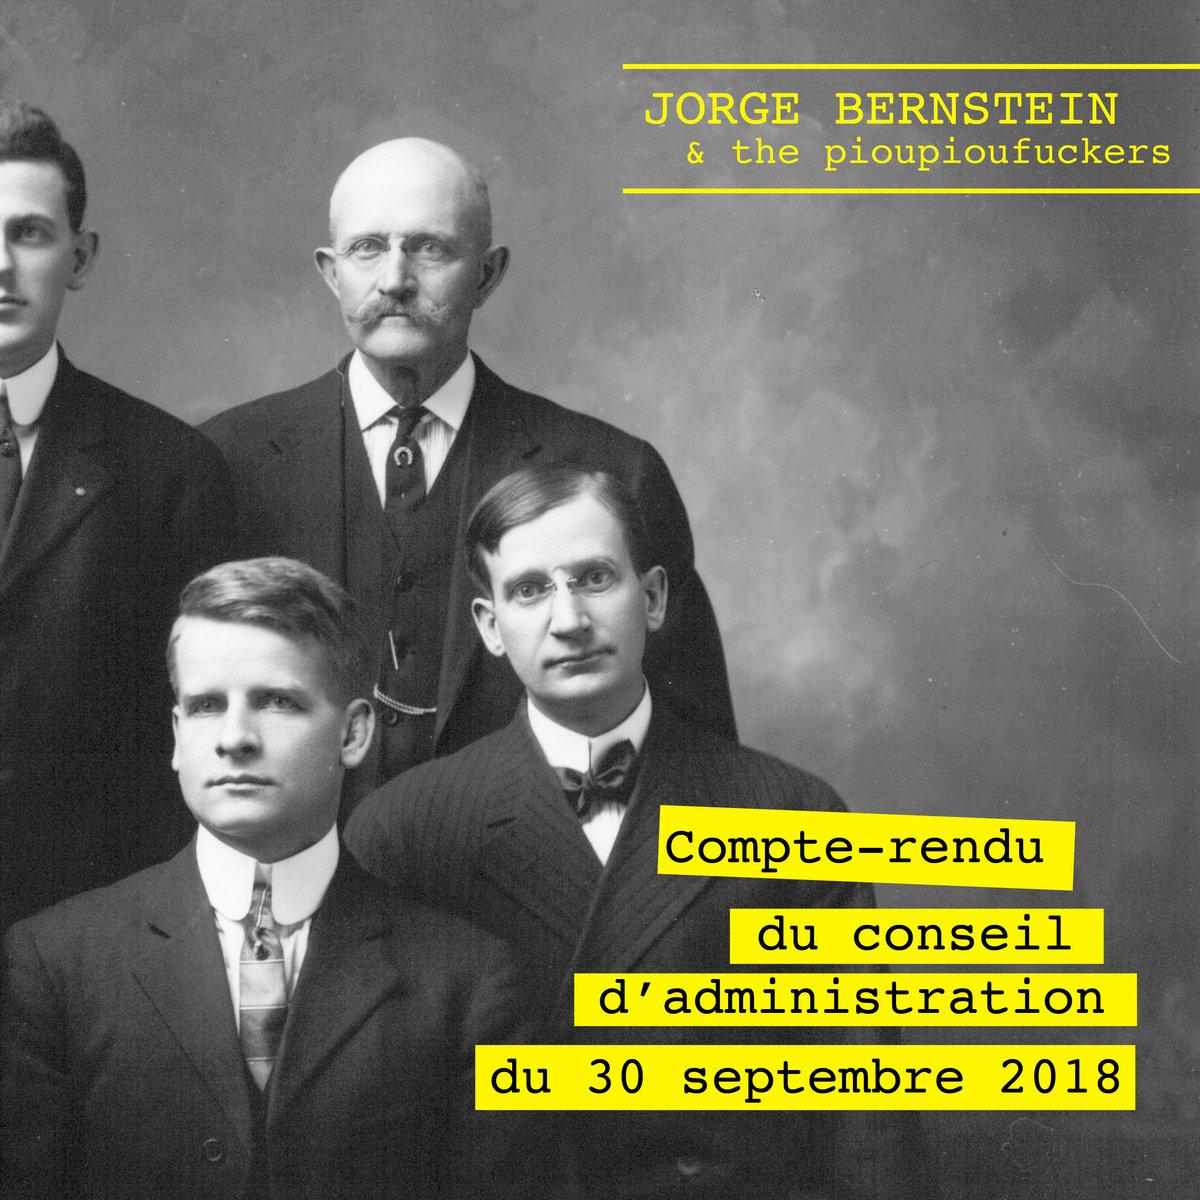 Jorge Bernstein & The Pioupioufuckers – Compte-Rendu du Conseil d'Administration du 30 Septembre 2018